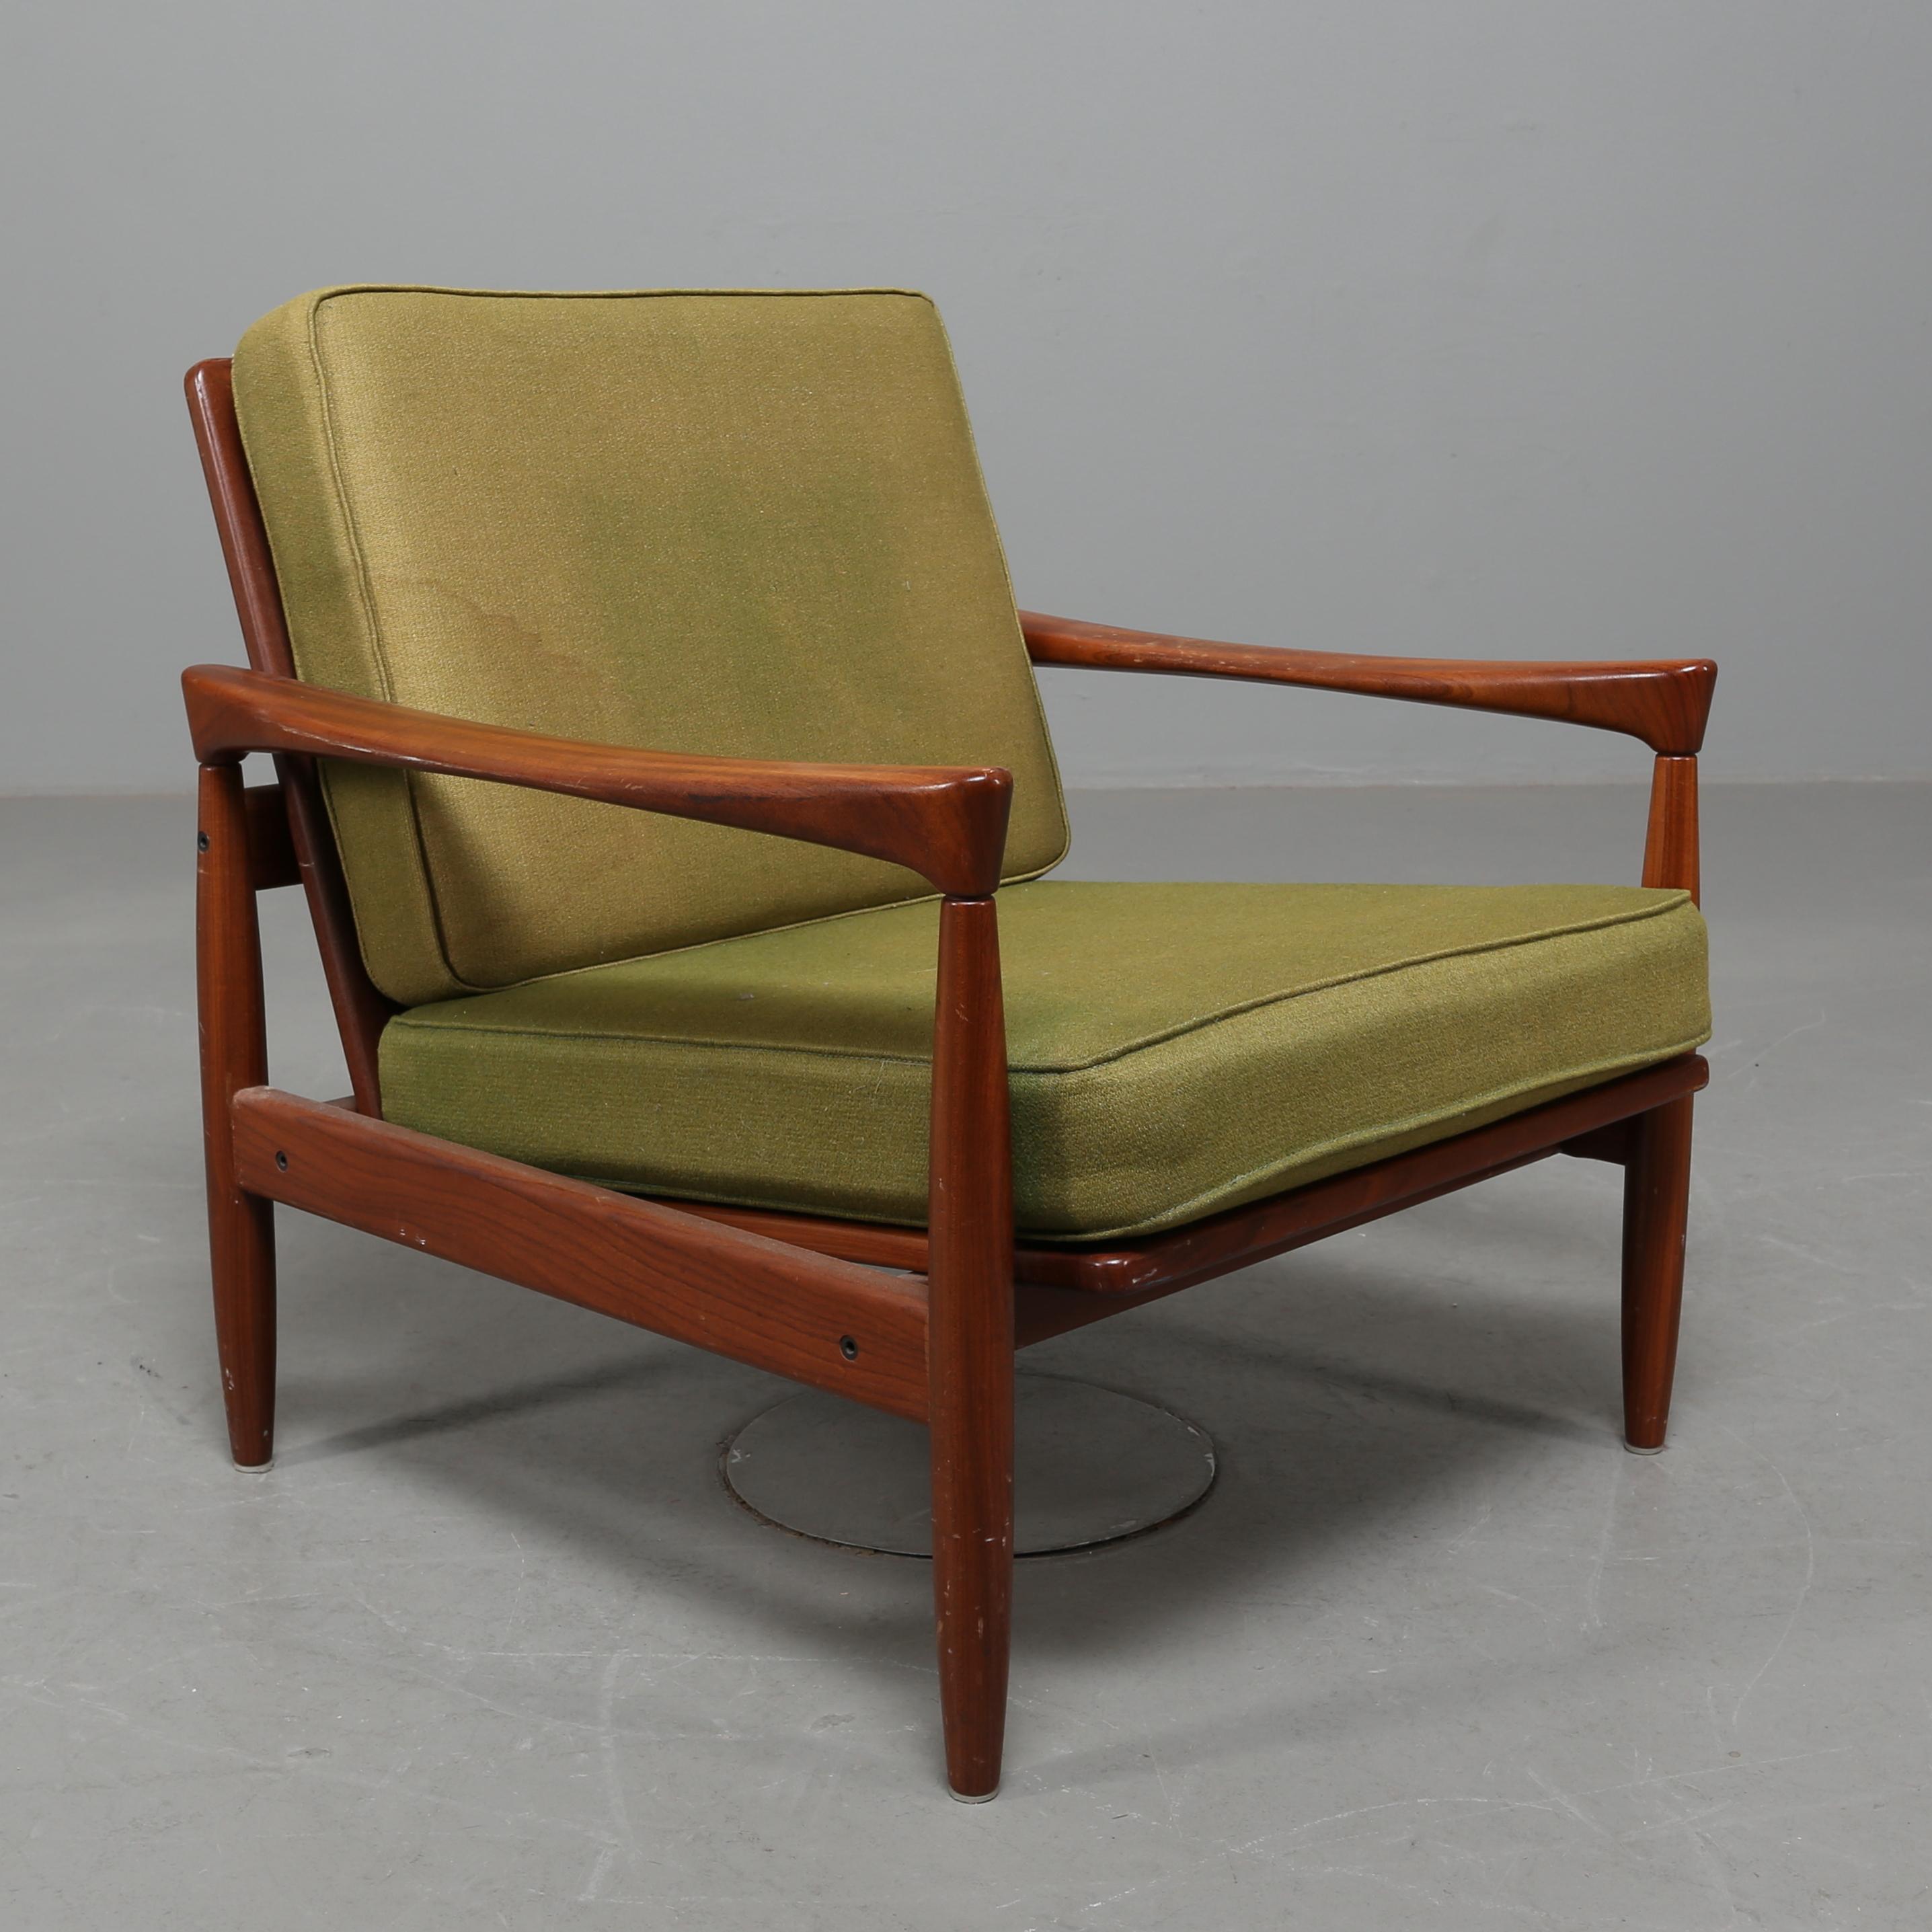 FÅTÖLJ, Erik Wörtz, IKEA, 195060 tal. Möbler Fåtöljer